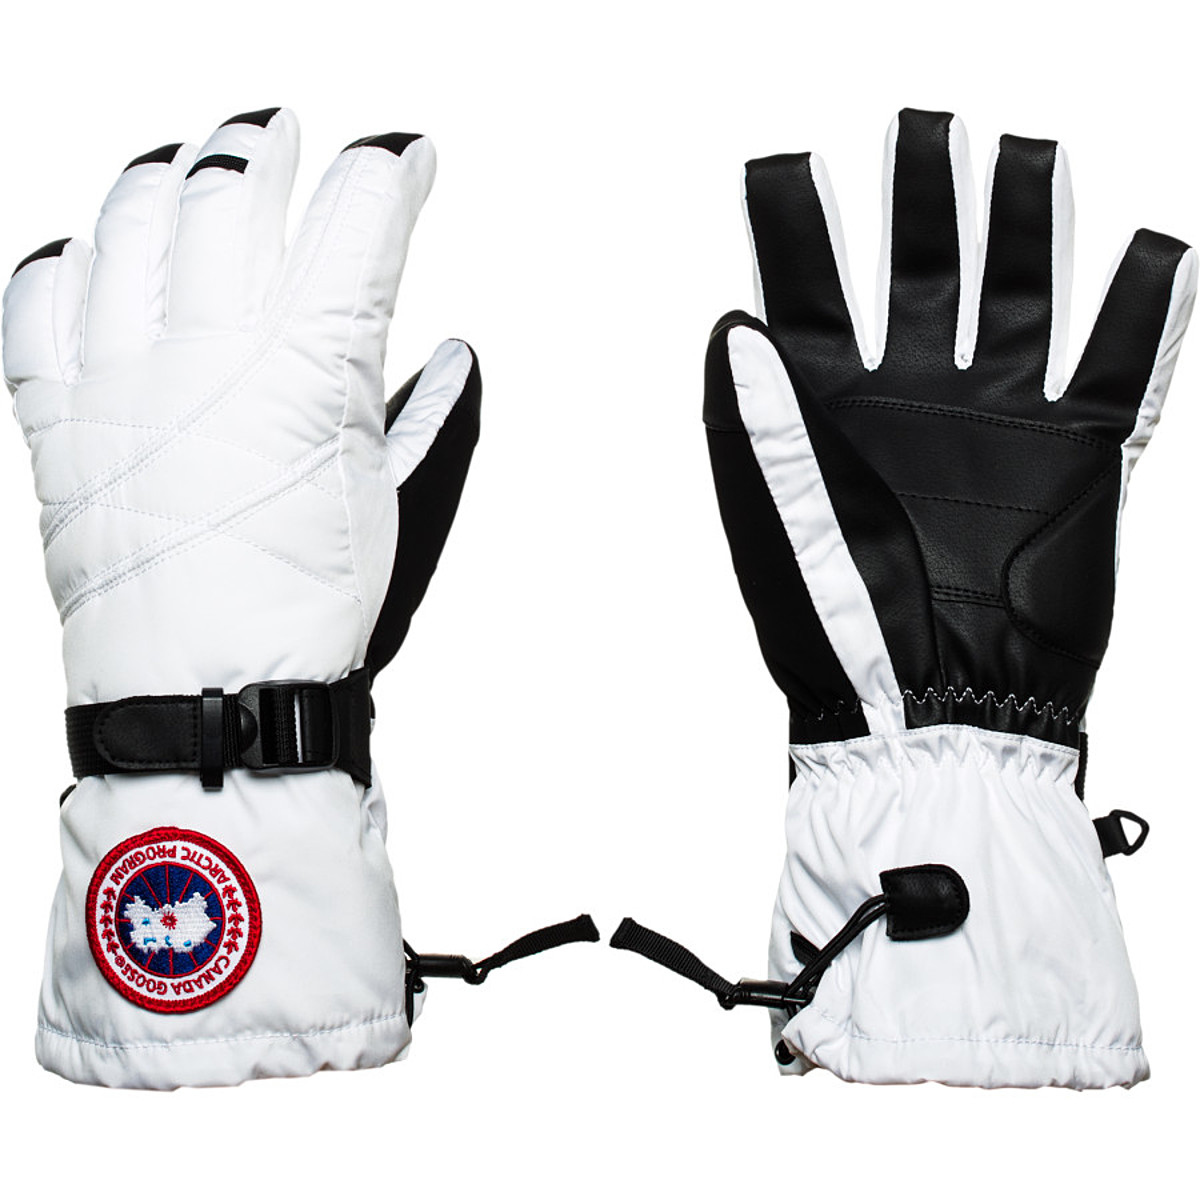 photo of a Canada Goose glove/mitten